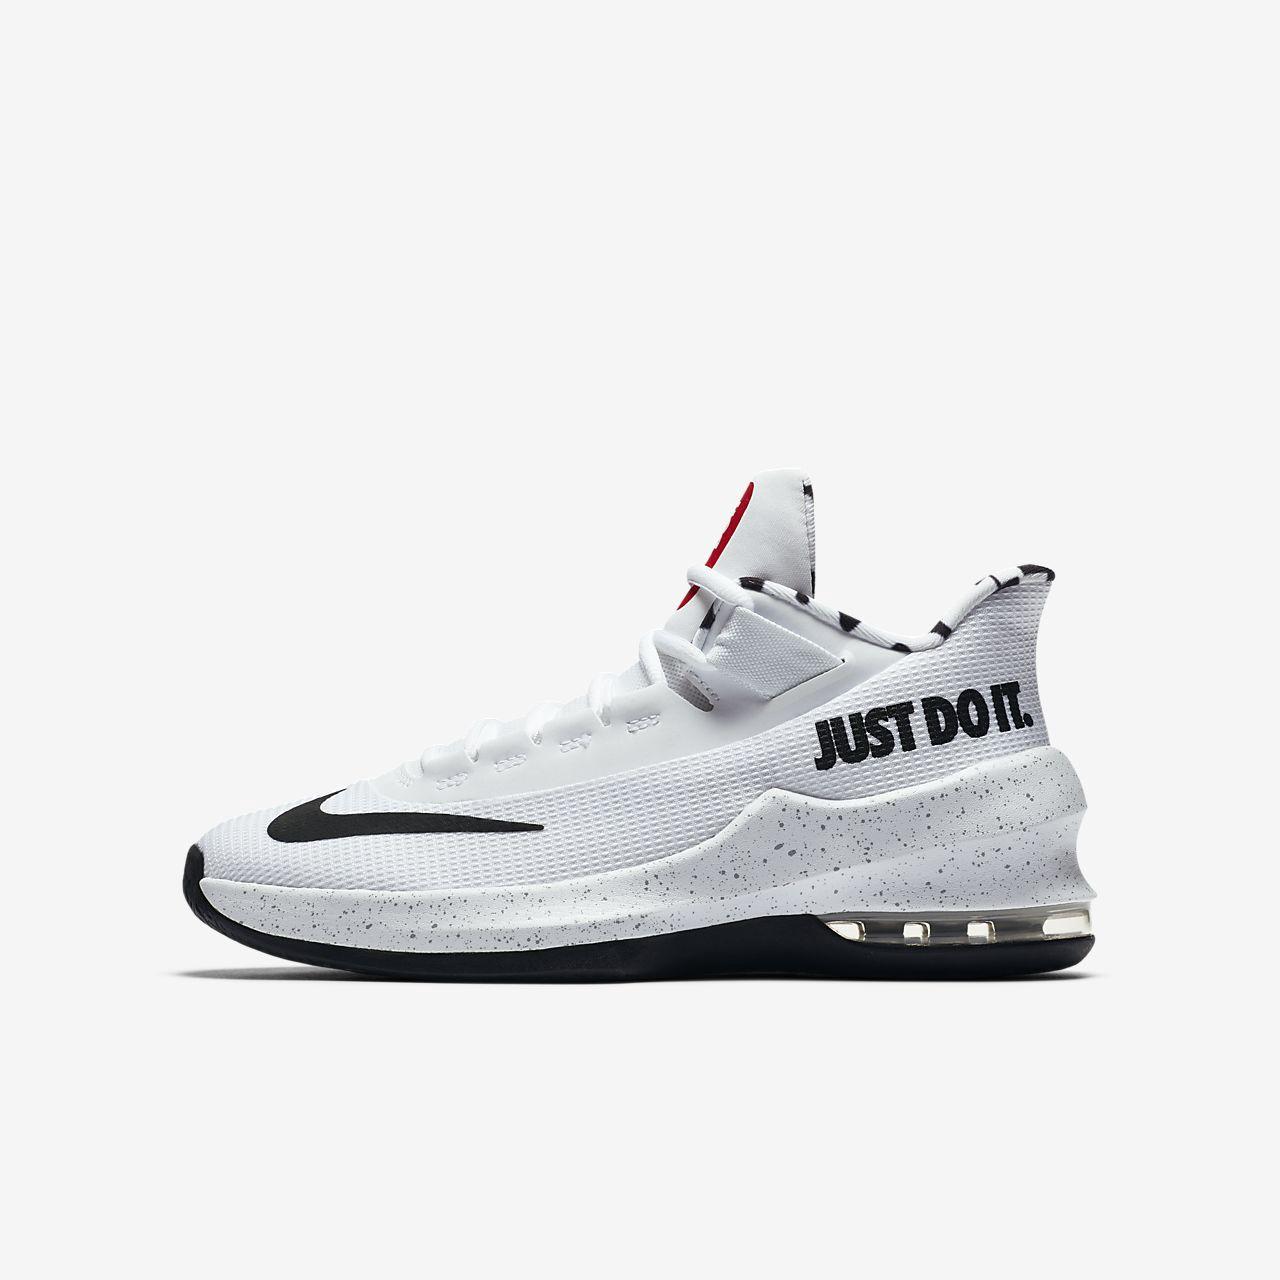 384636bb792 Nike Air Max Infuriate II Just Do It Little Big Kids  Basketball Shoe - 4.5Y